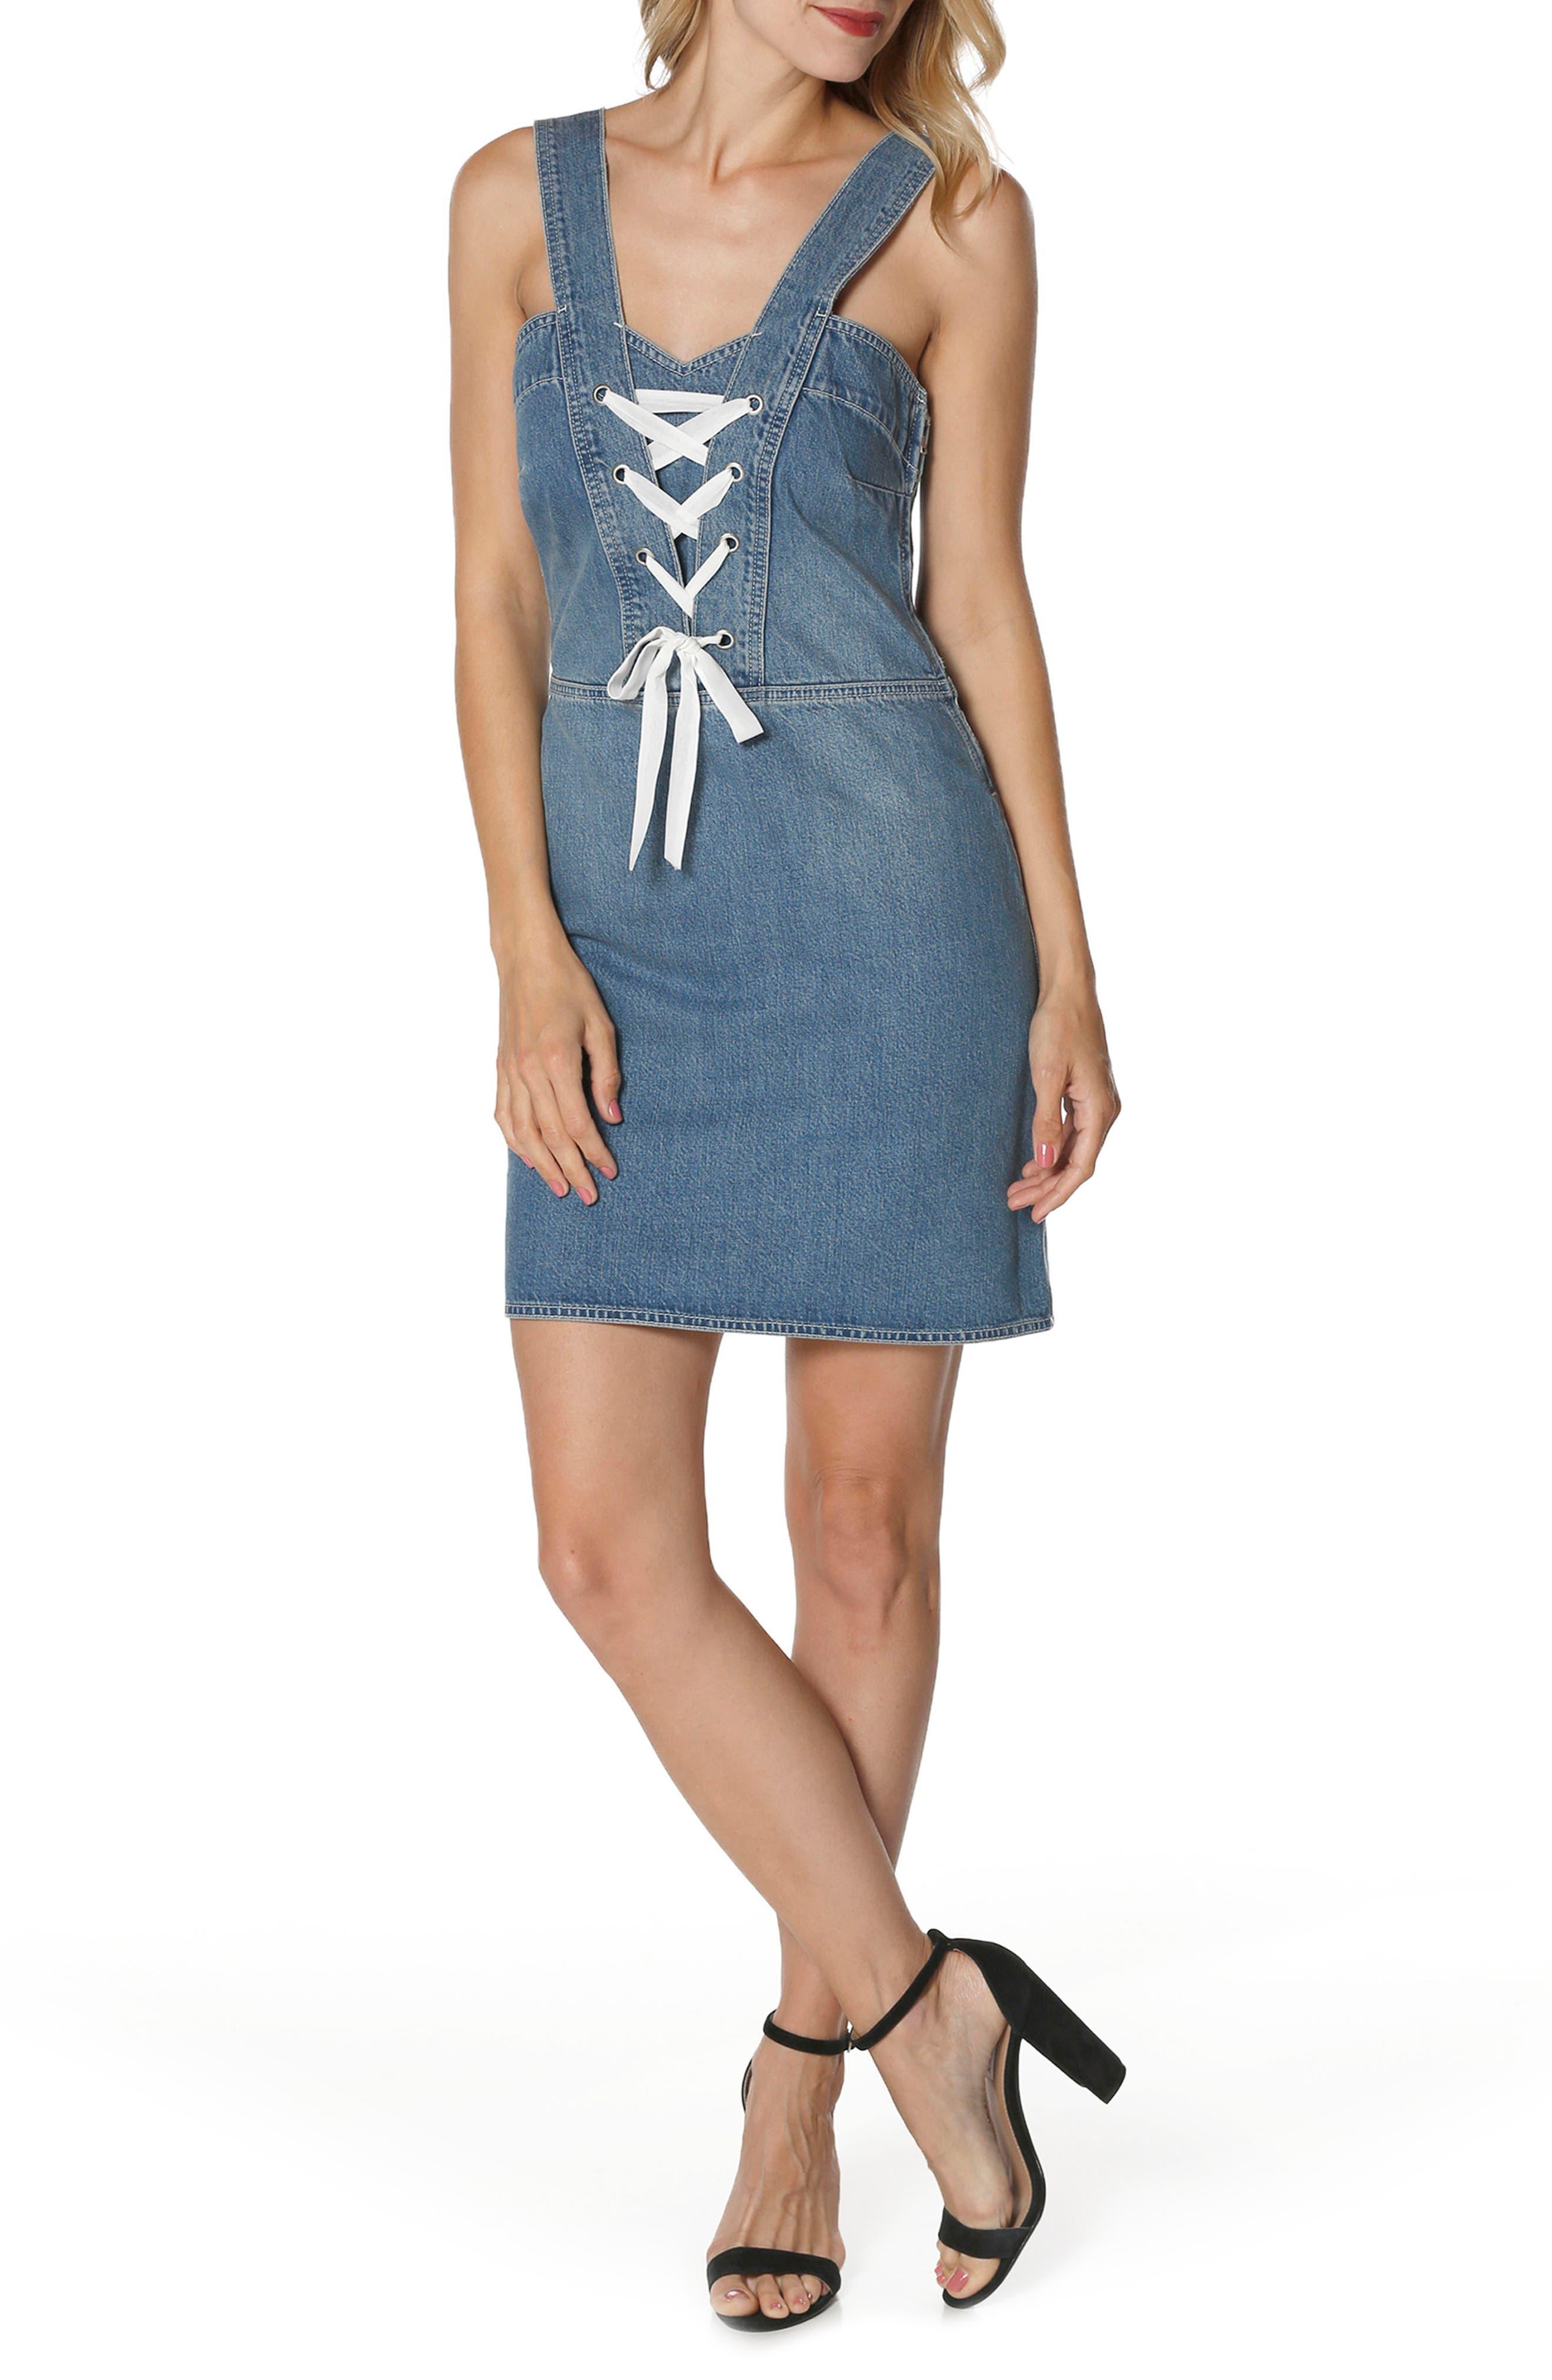 Tula Lace-Up Denim Dress,                             Main thumbnail 1, color,                             400